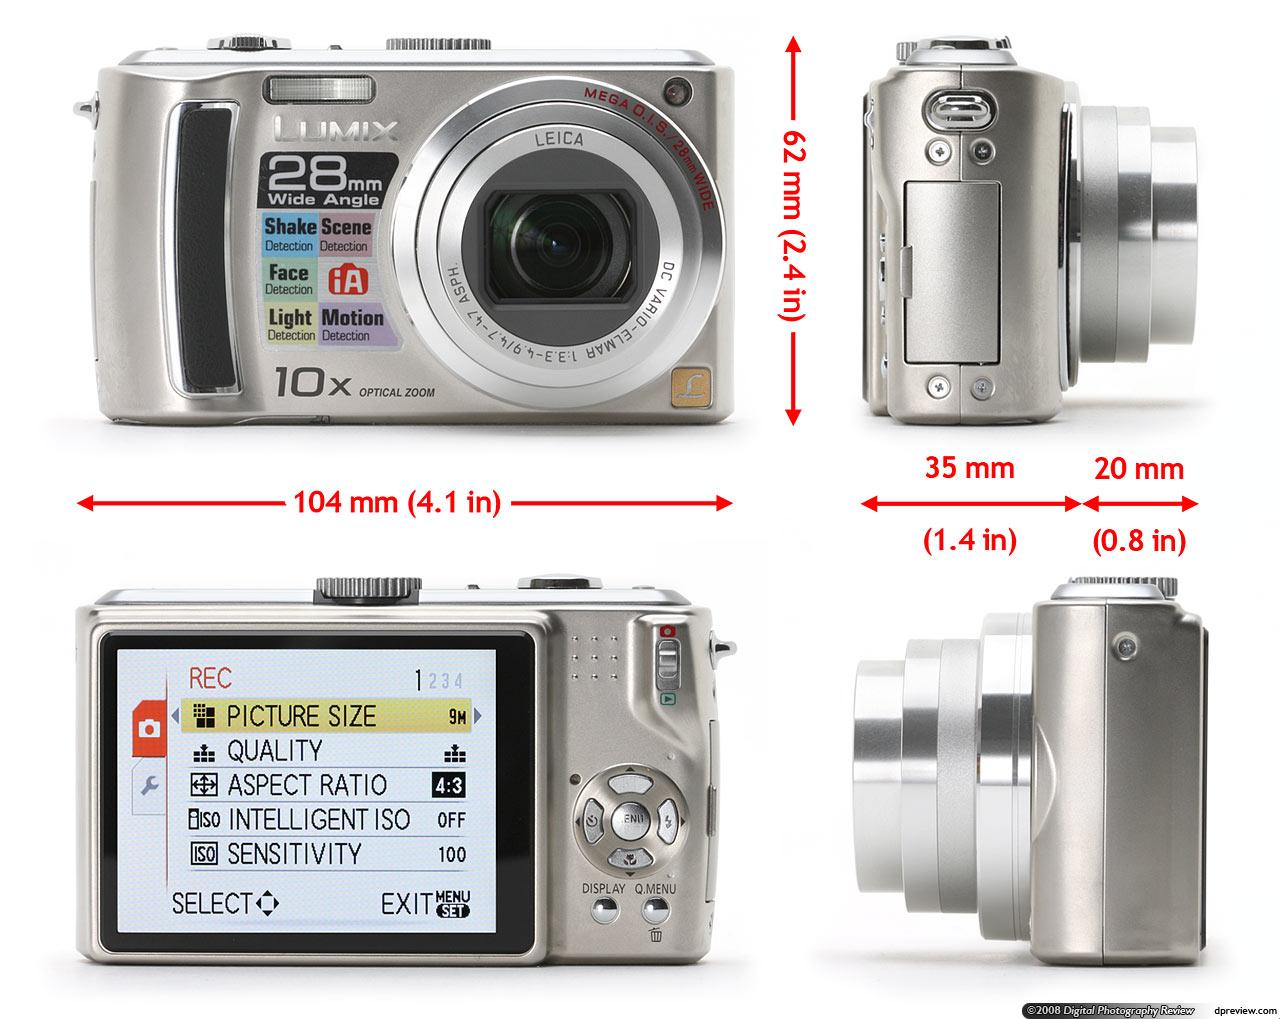 panasonic lumix dmc tz5 concise review digital photography review rh dpreview com Lumix GX7 Lumix Camera 2013